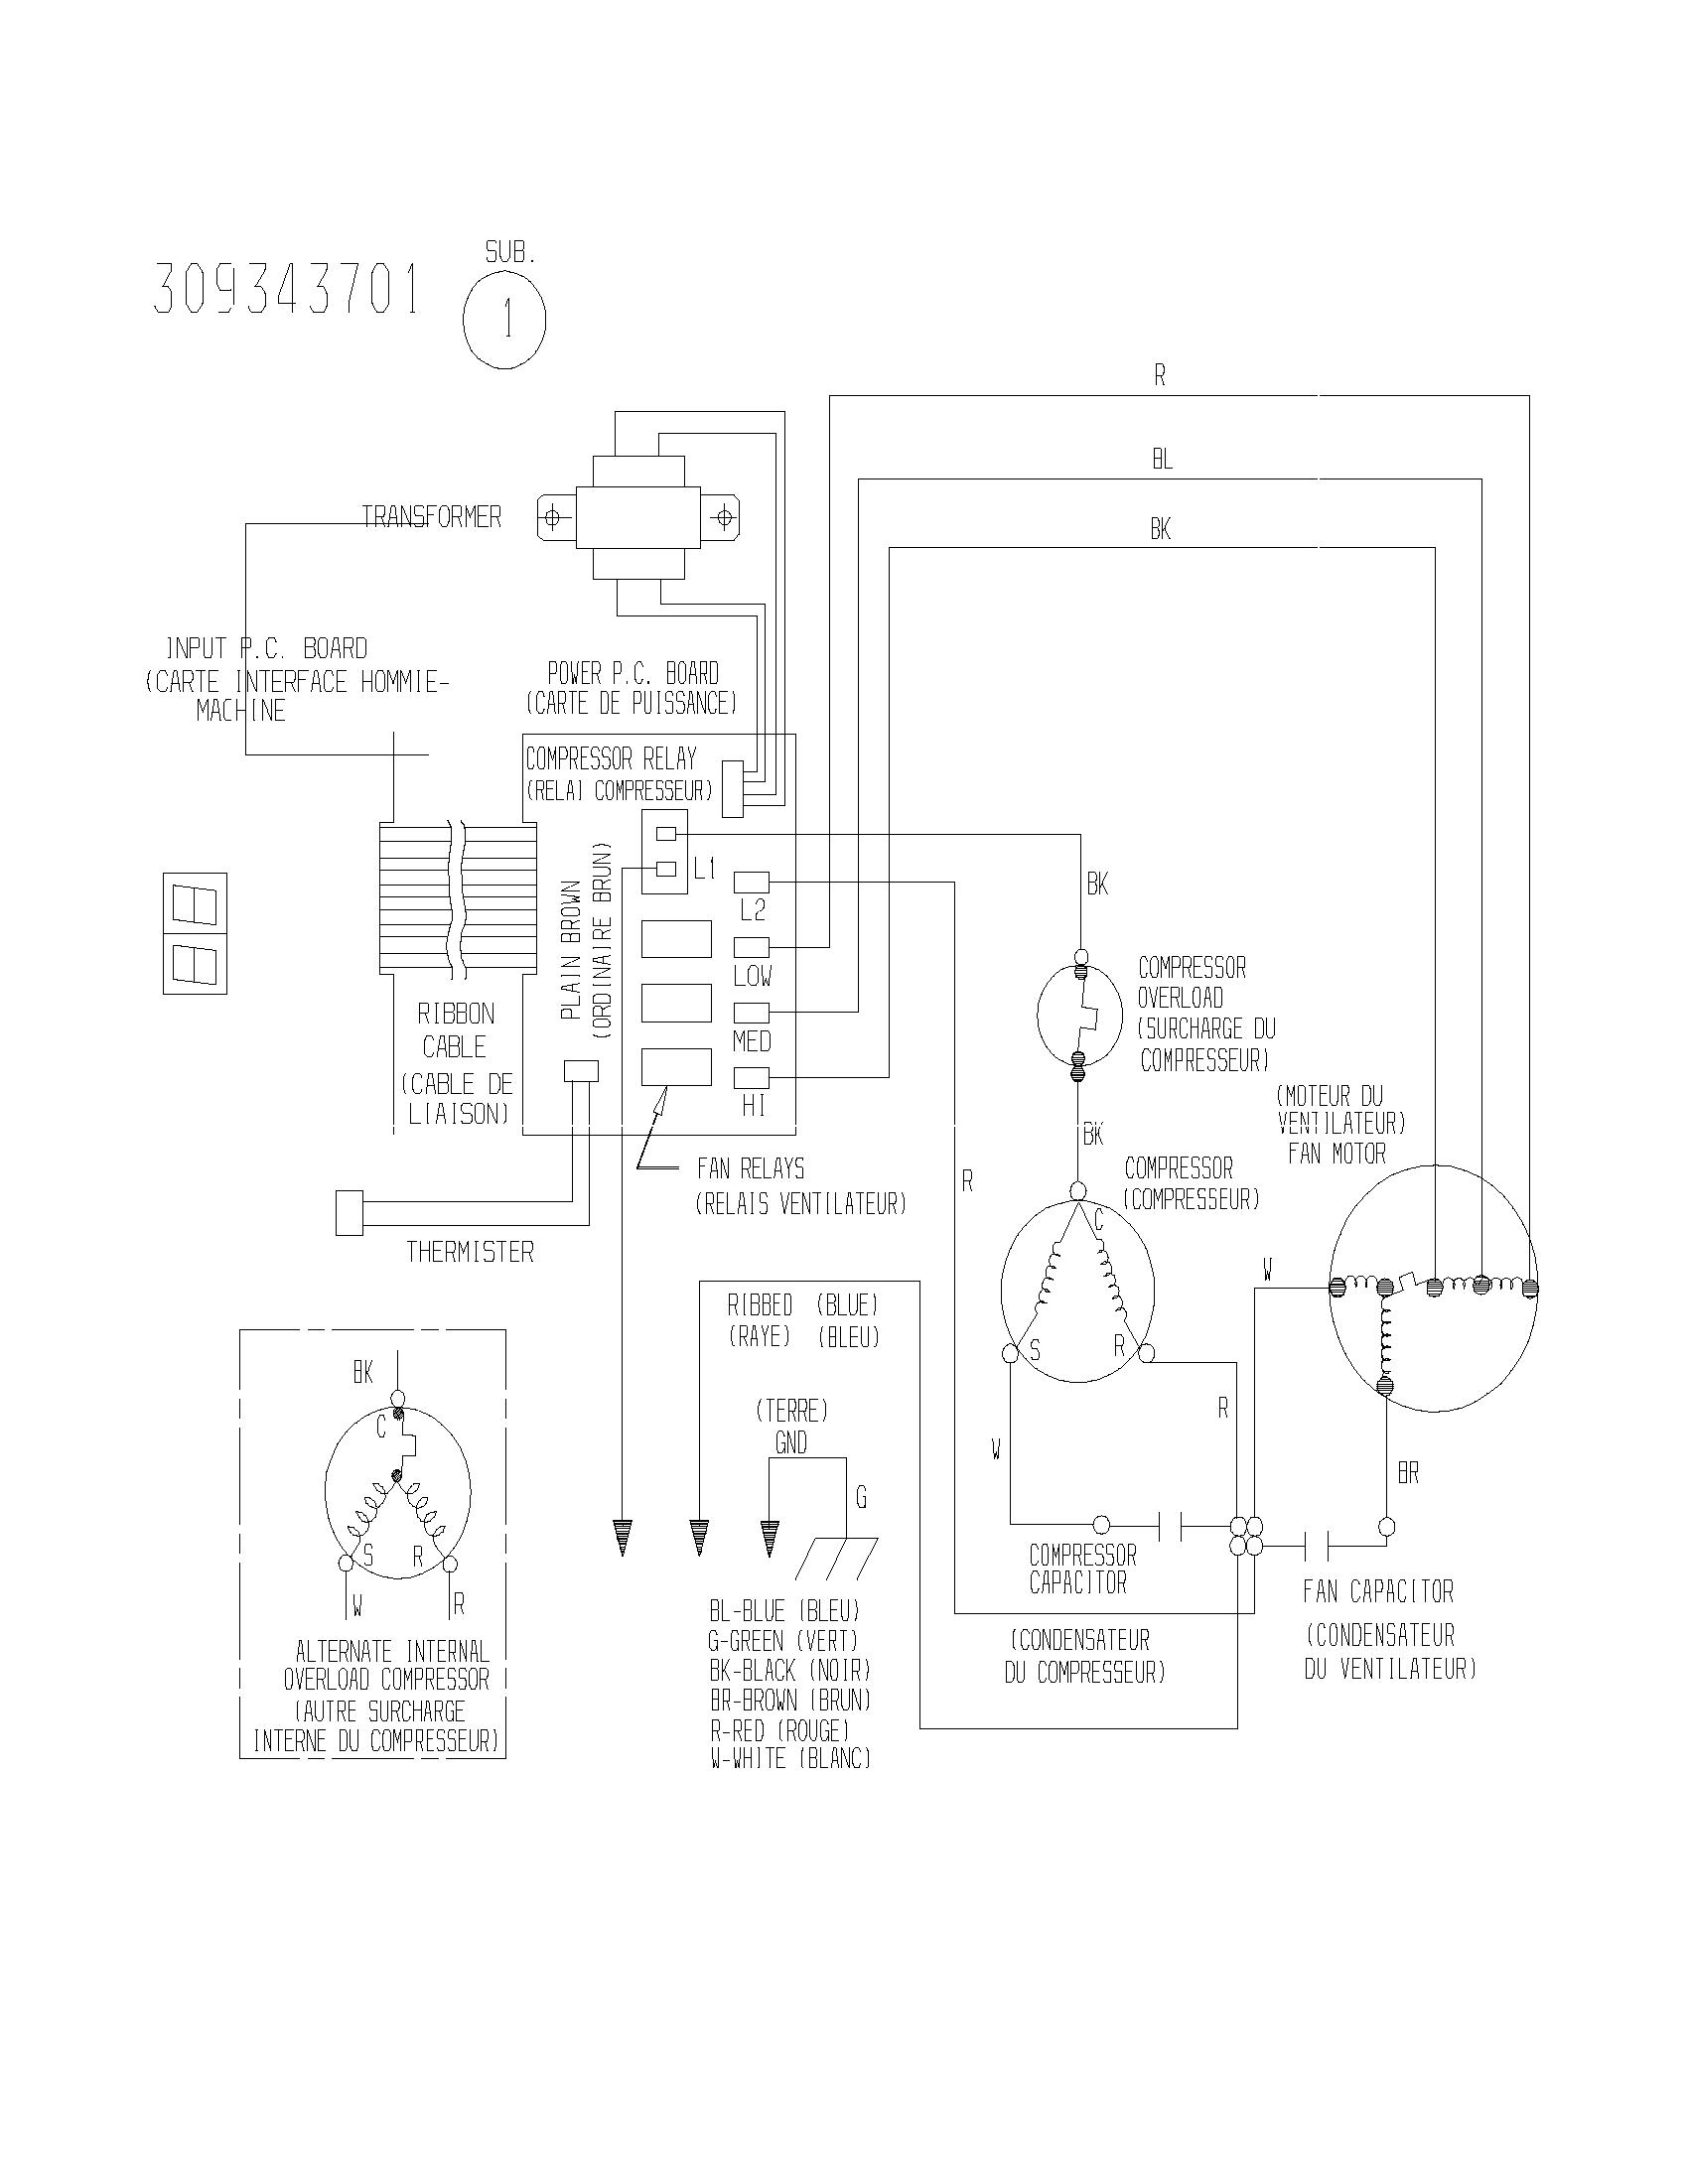 copeland scroll wiring diagram kenmore gas dryer hermetic pressors internet of